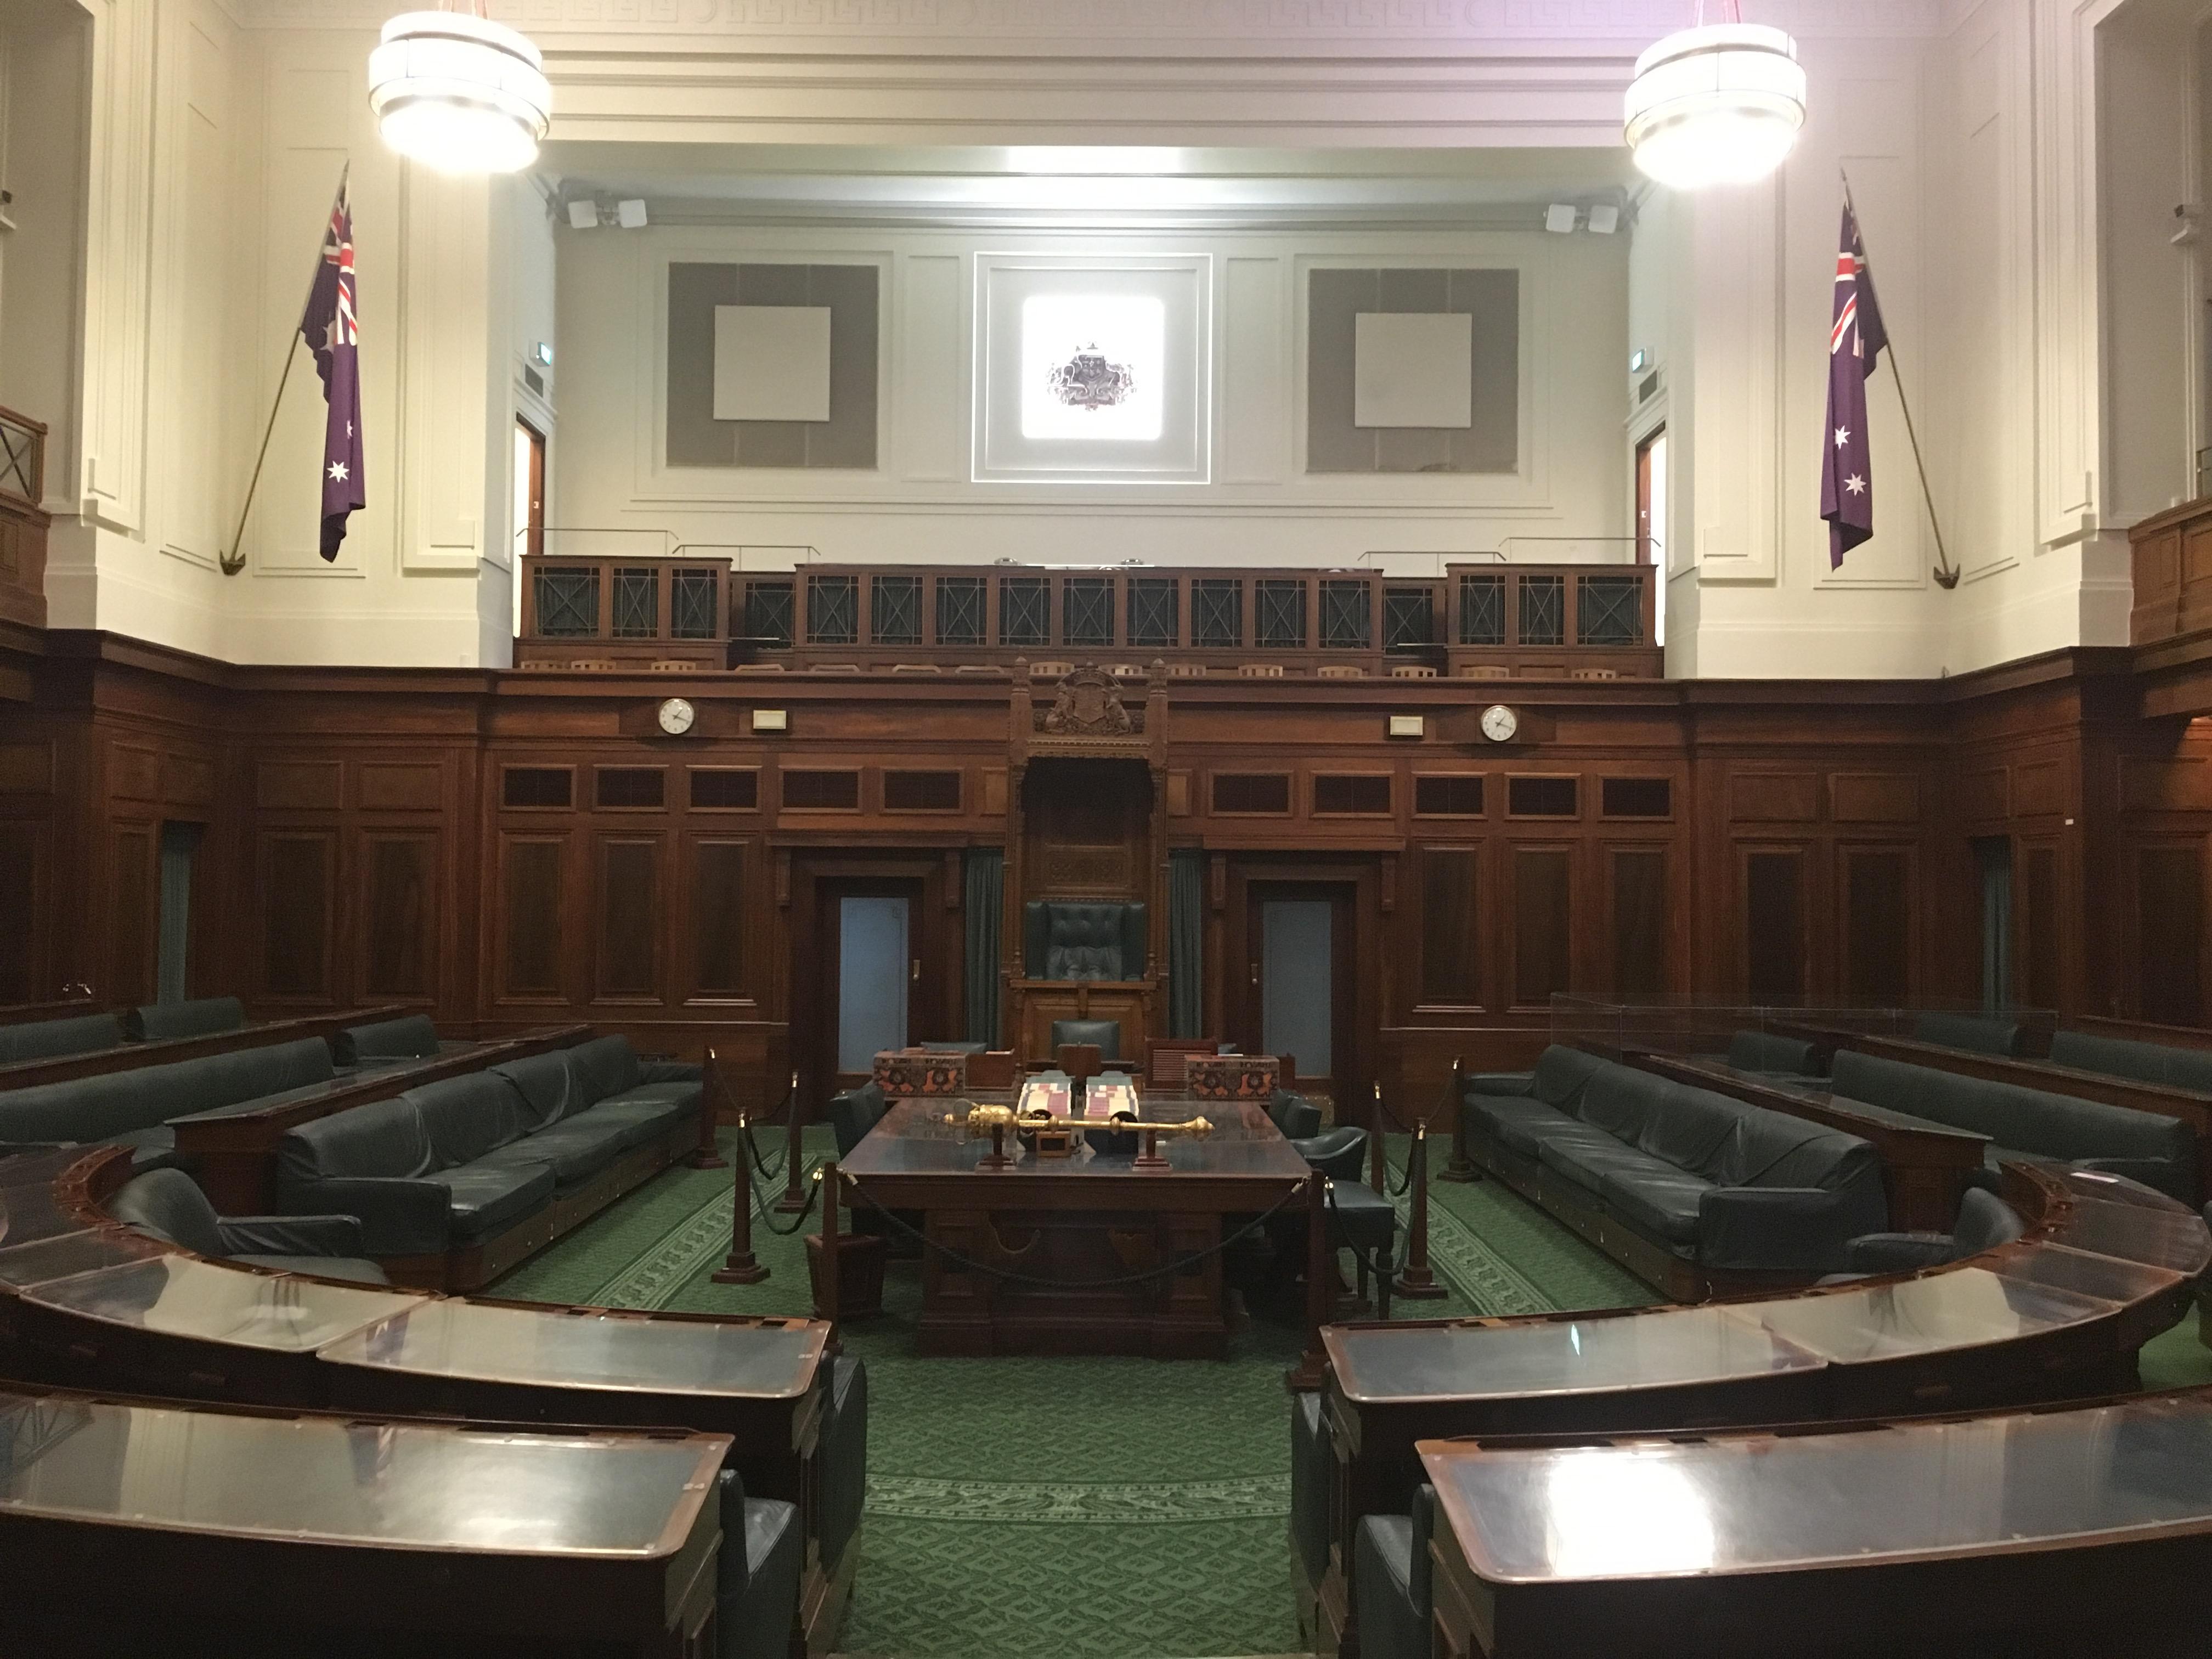 Top Secret Tour of Old Parliament House – TIM the YOWIE MAN